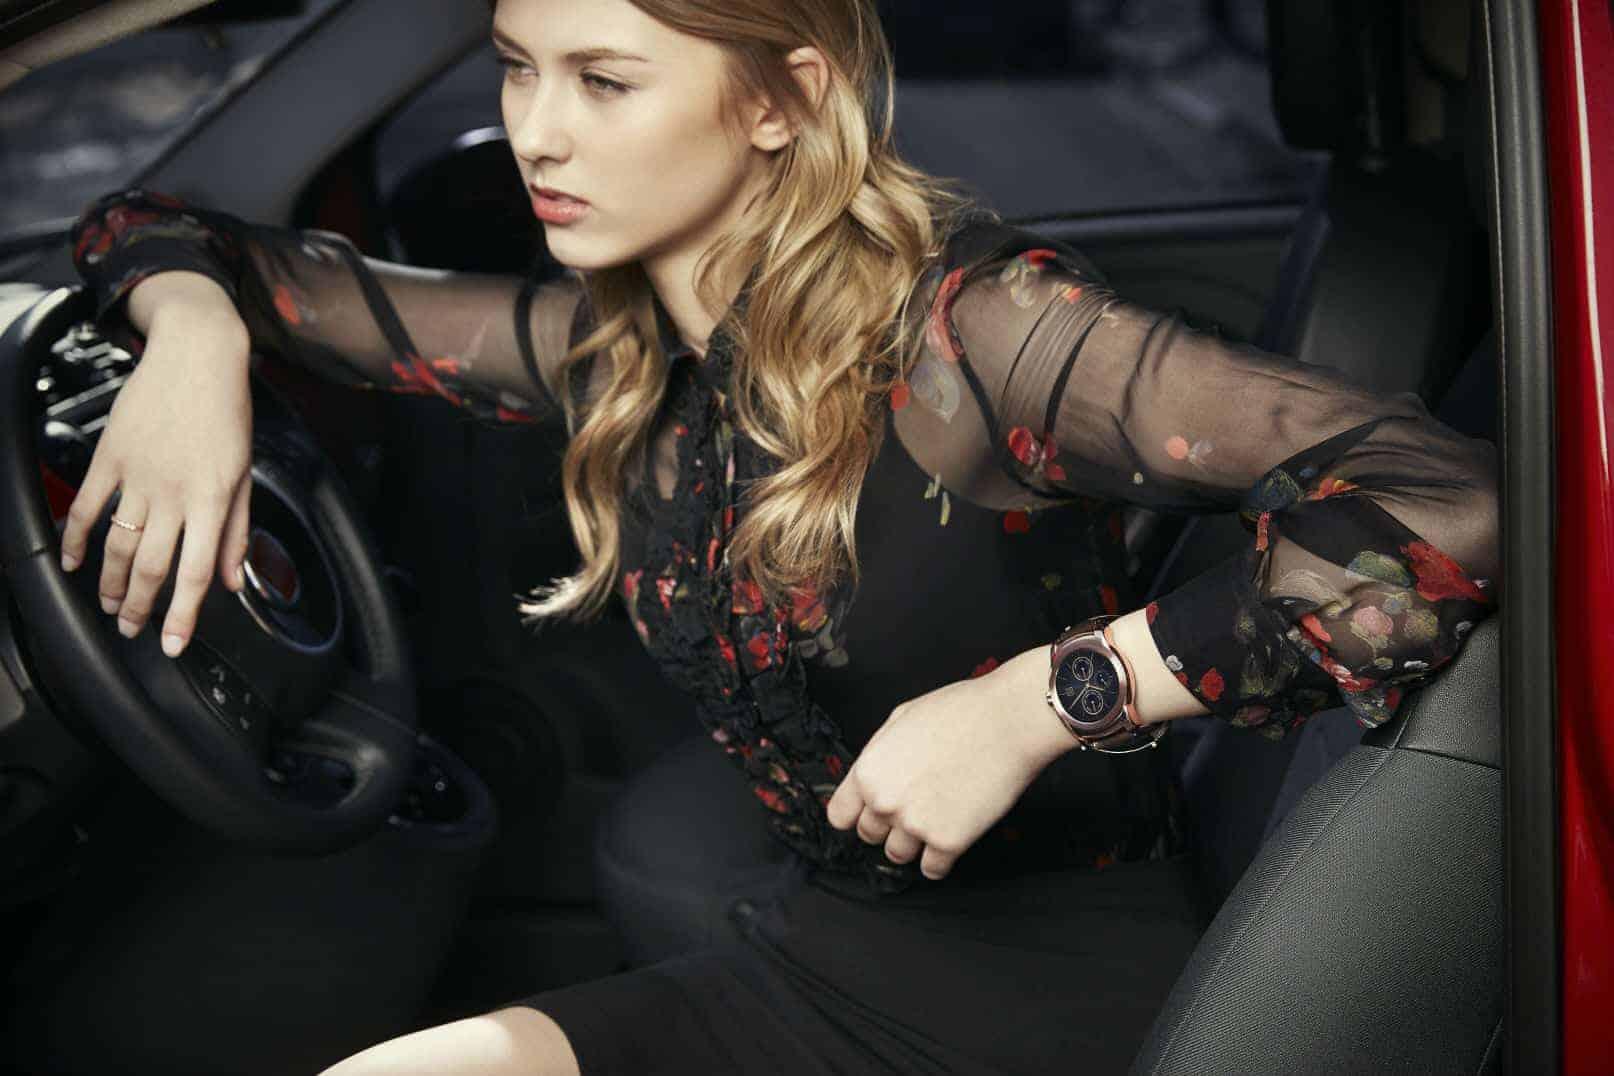 LG Watch Urbane4